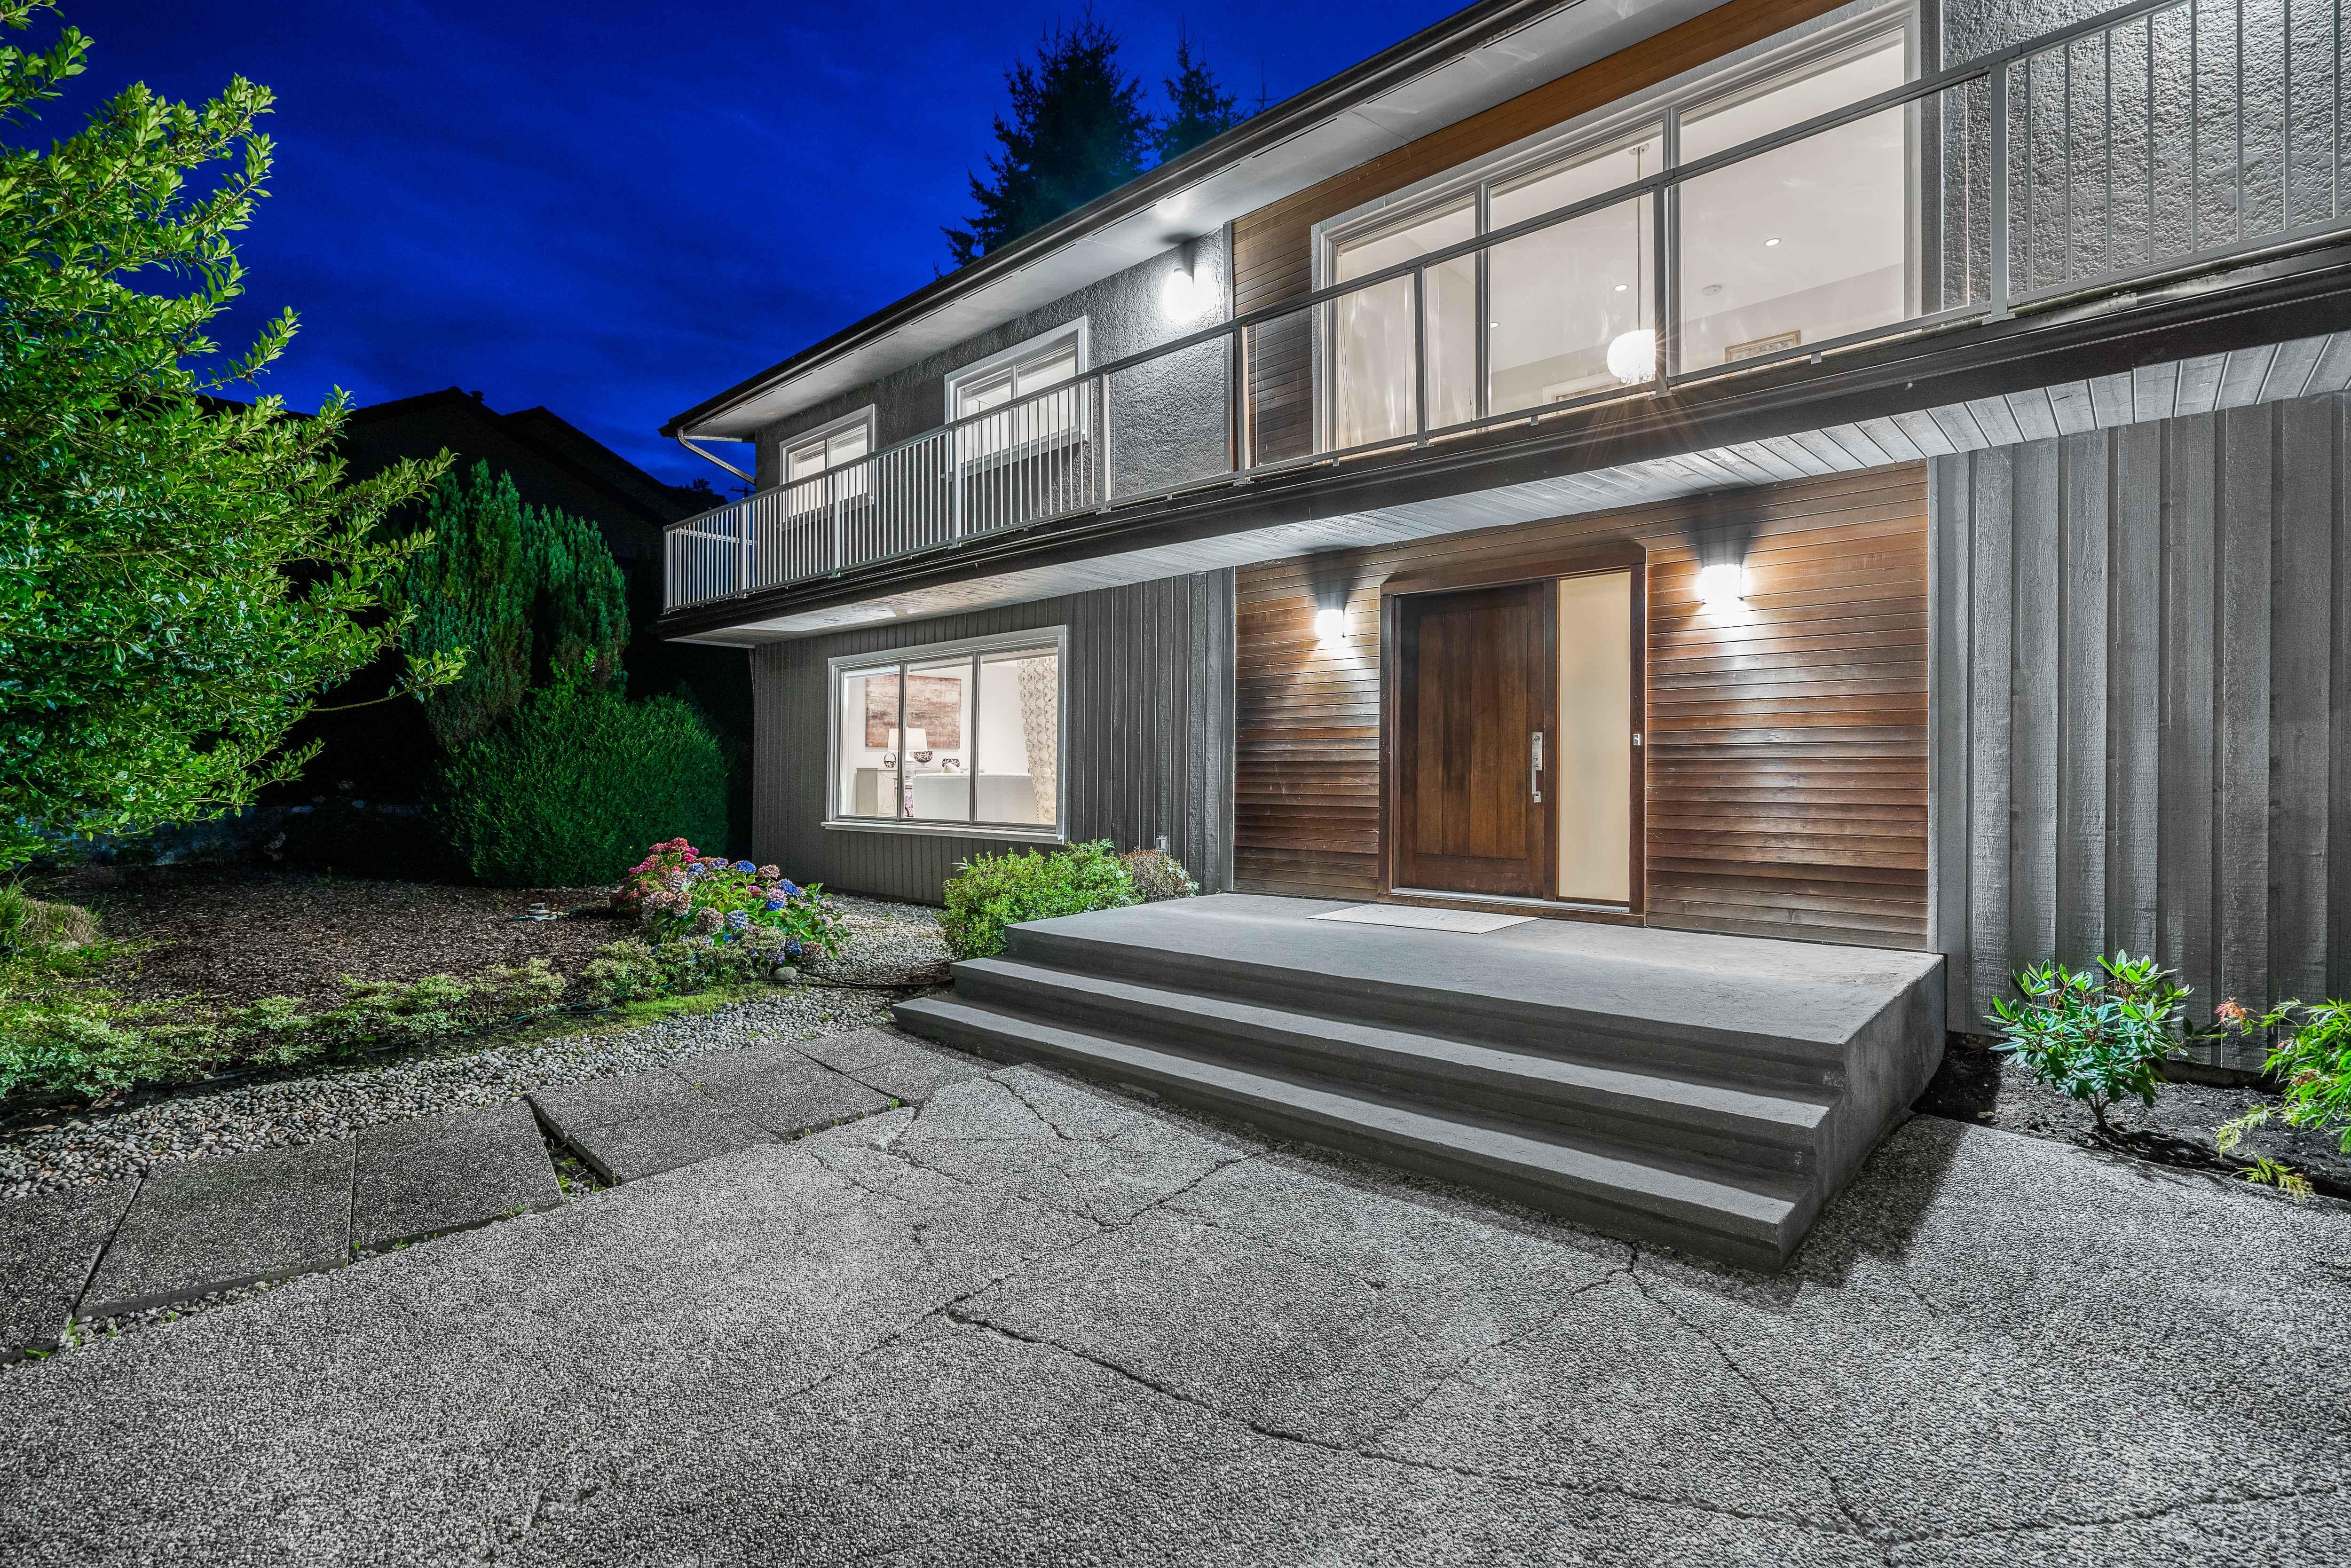 701 Kenwood Road, British Properties, West Vancouver 4